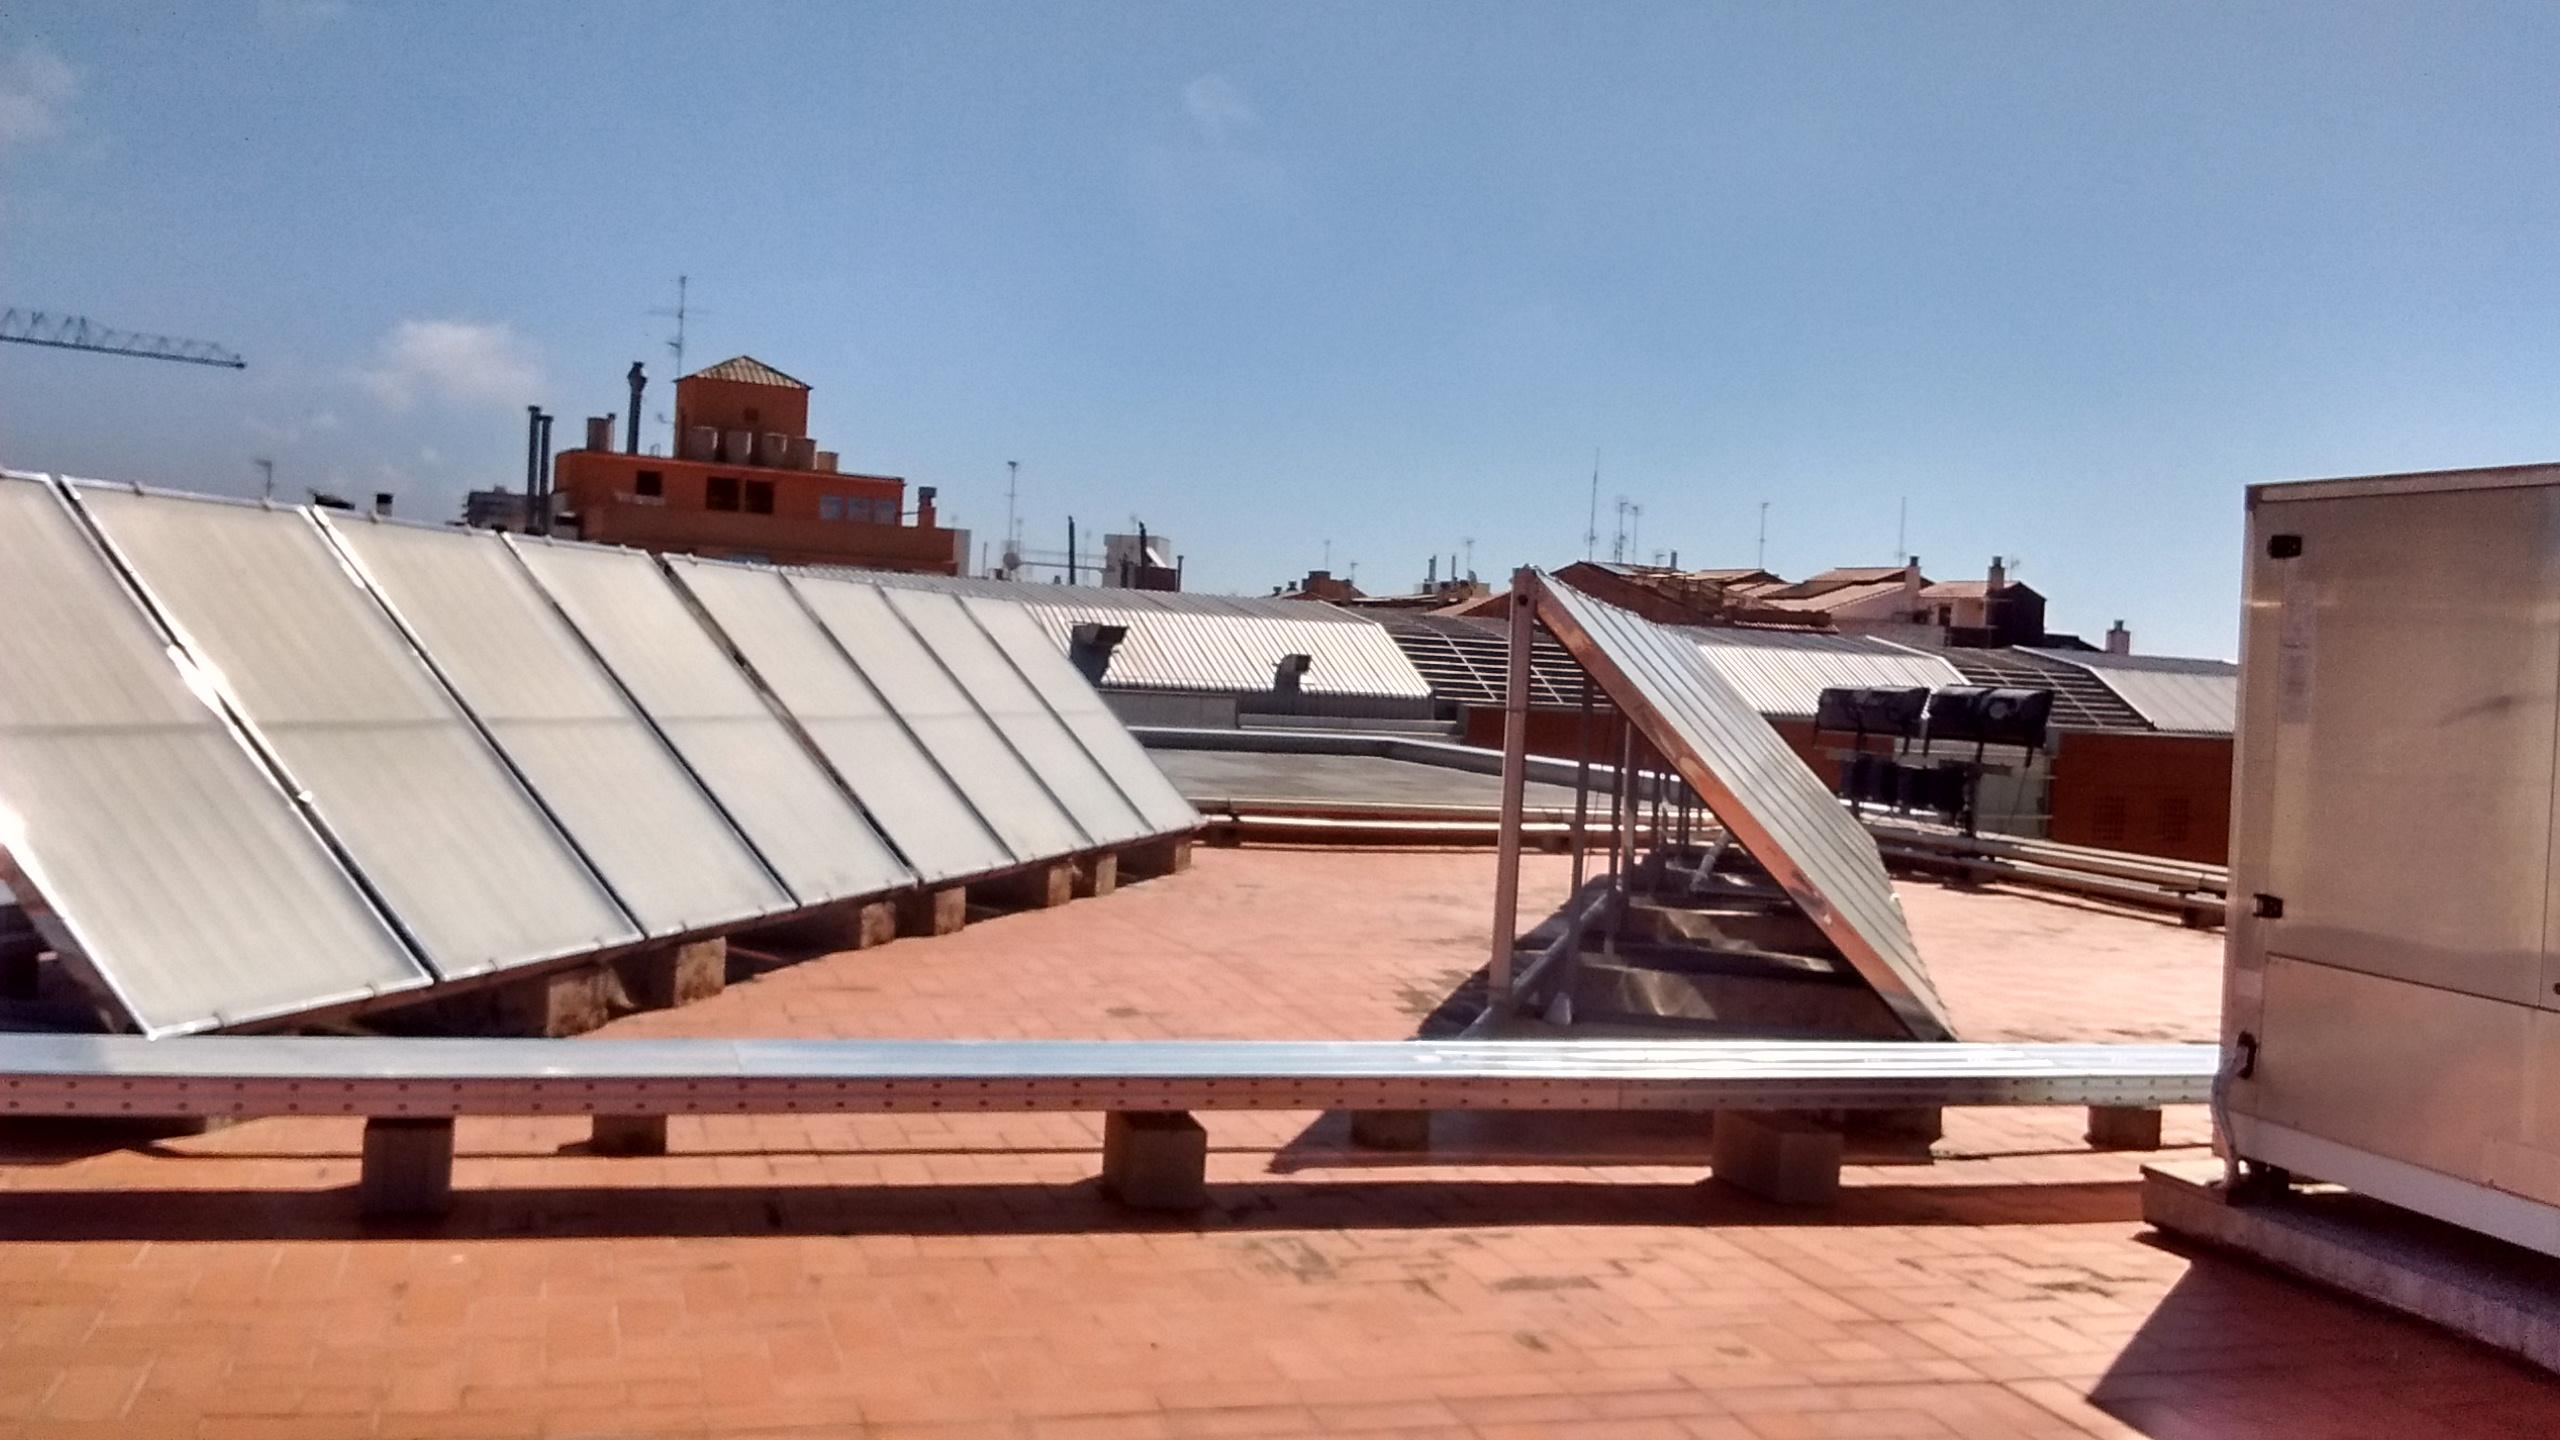 https://www.advanticsys.com/wp-content/uploads/2020/11/EscuelaP-rooftop.jpg